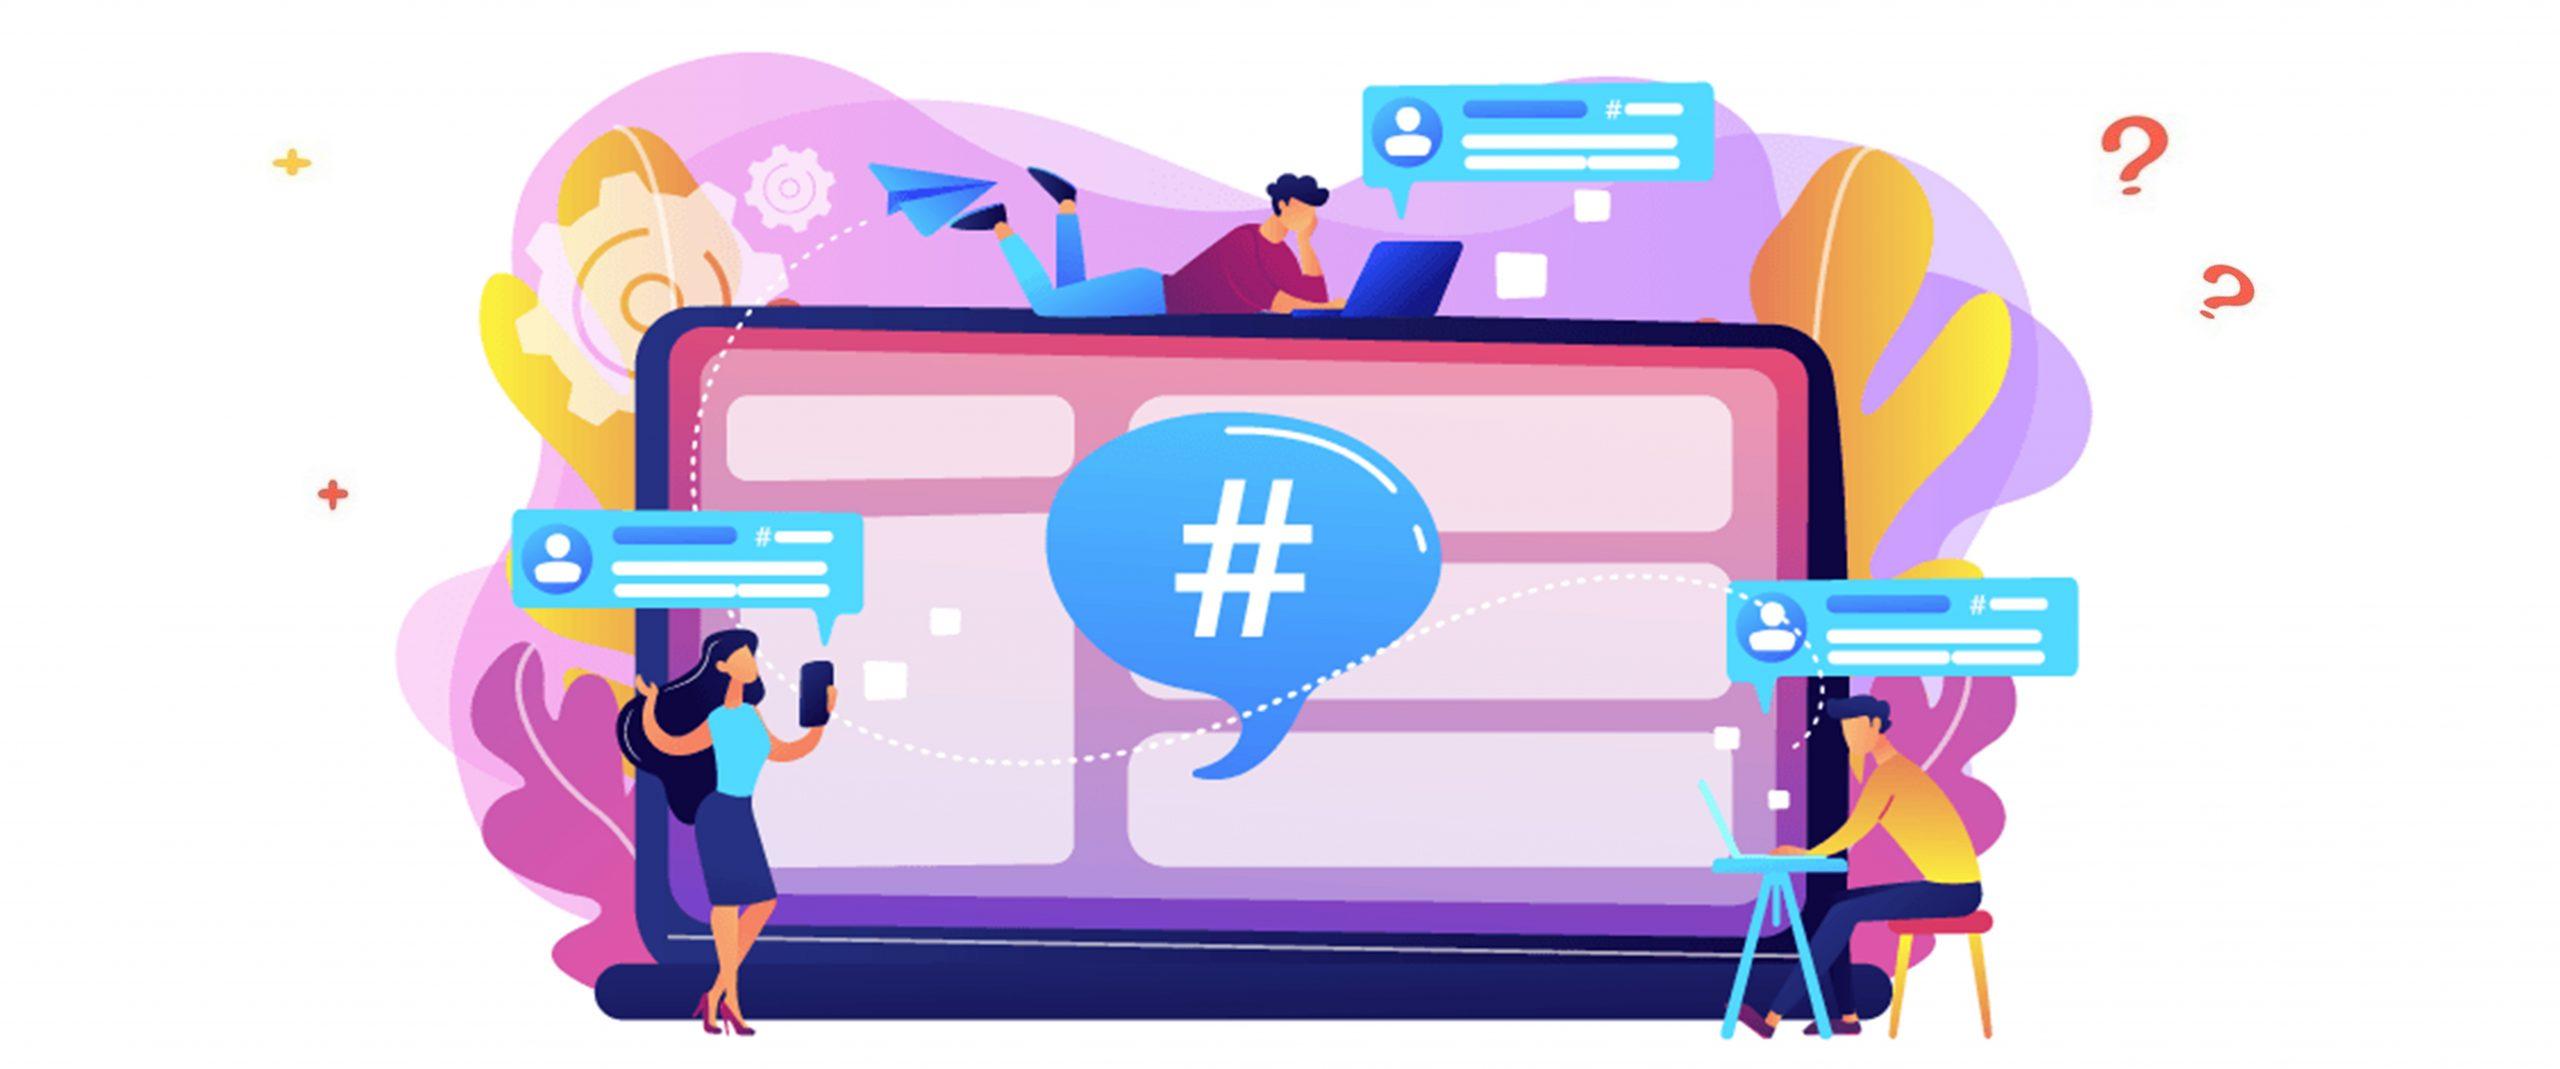 حفظ انگیزه کاری به صورت آنلاین